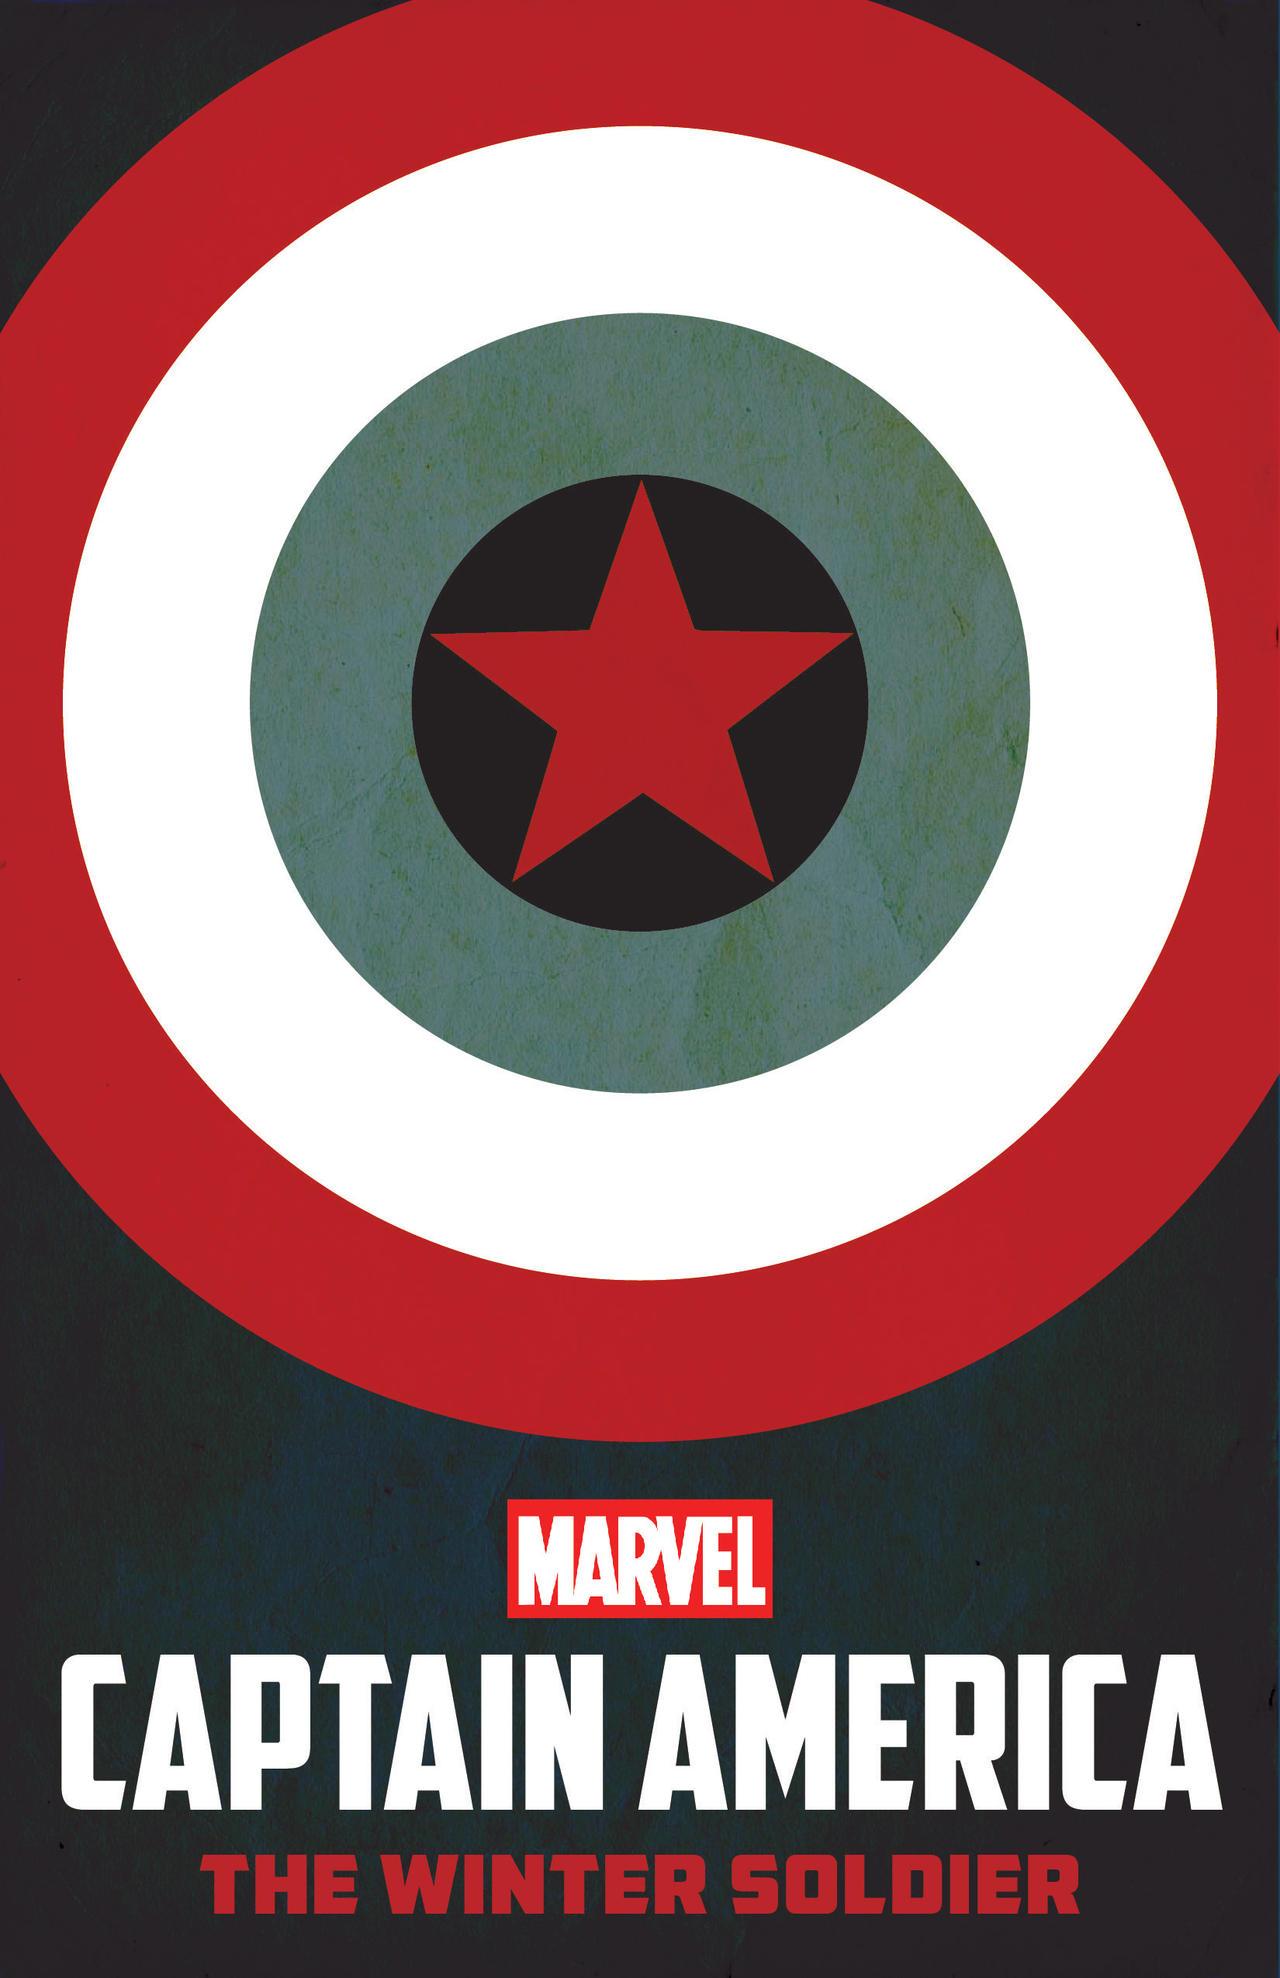 Captain America The Winter Soldier Alt Poster By Jk4000 On Deviantart